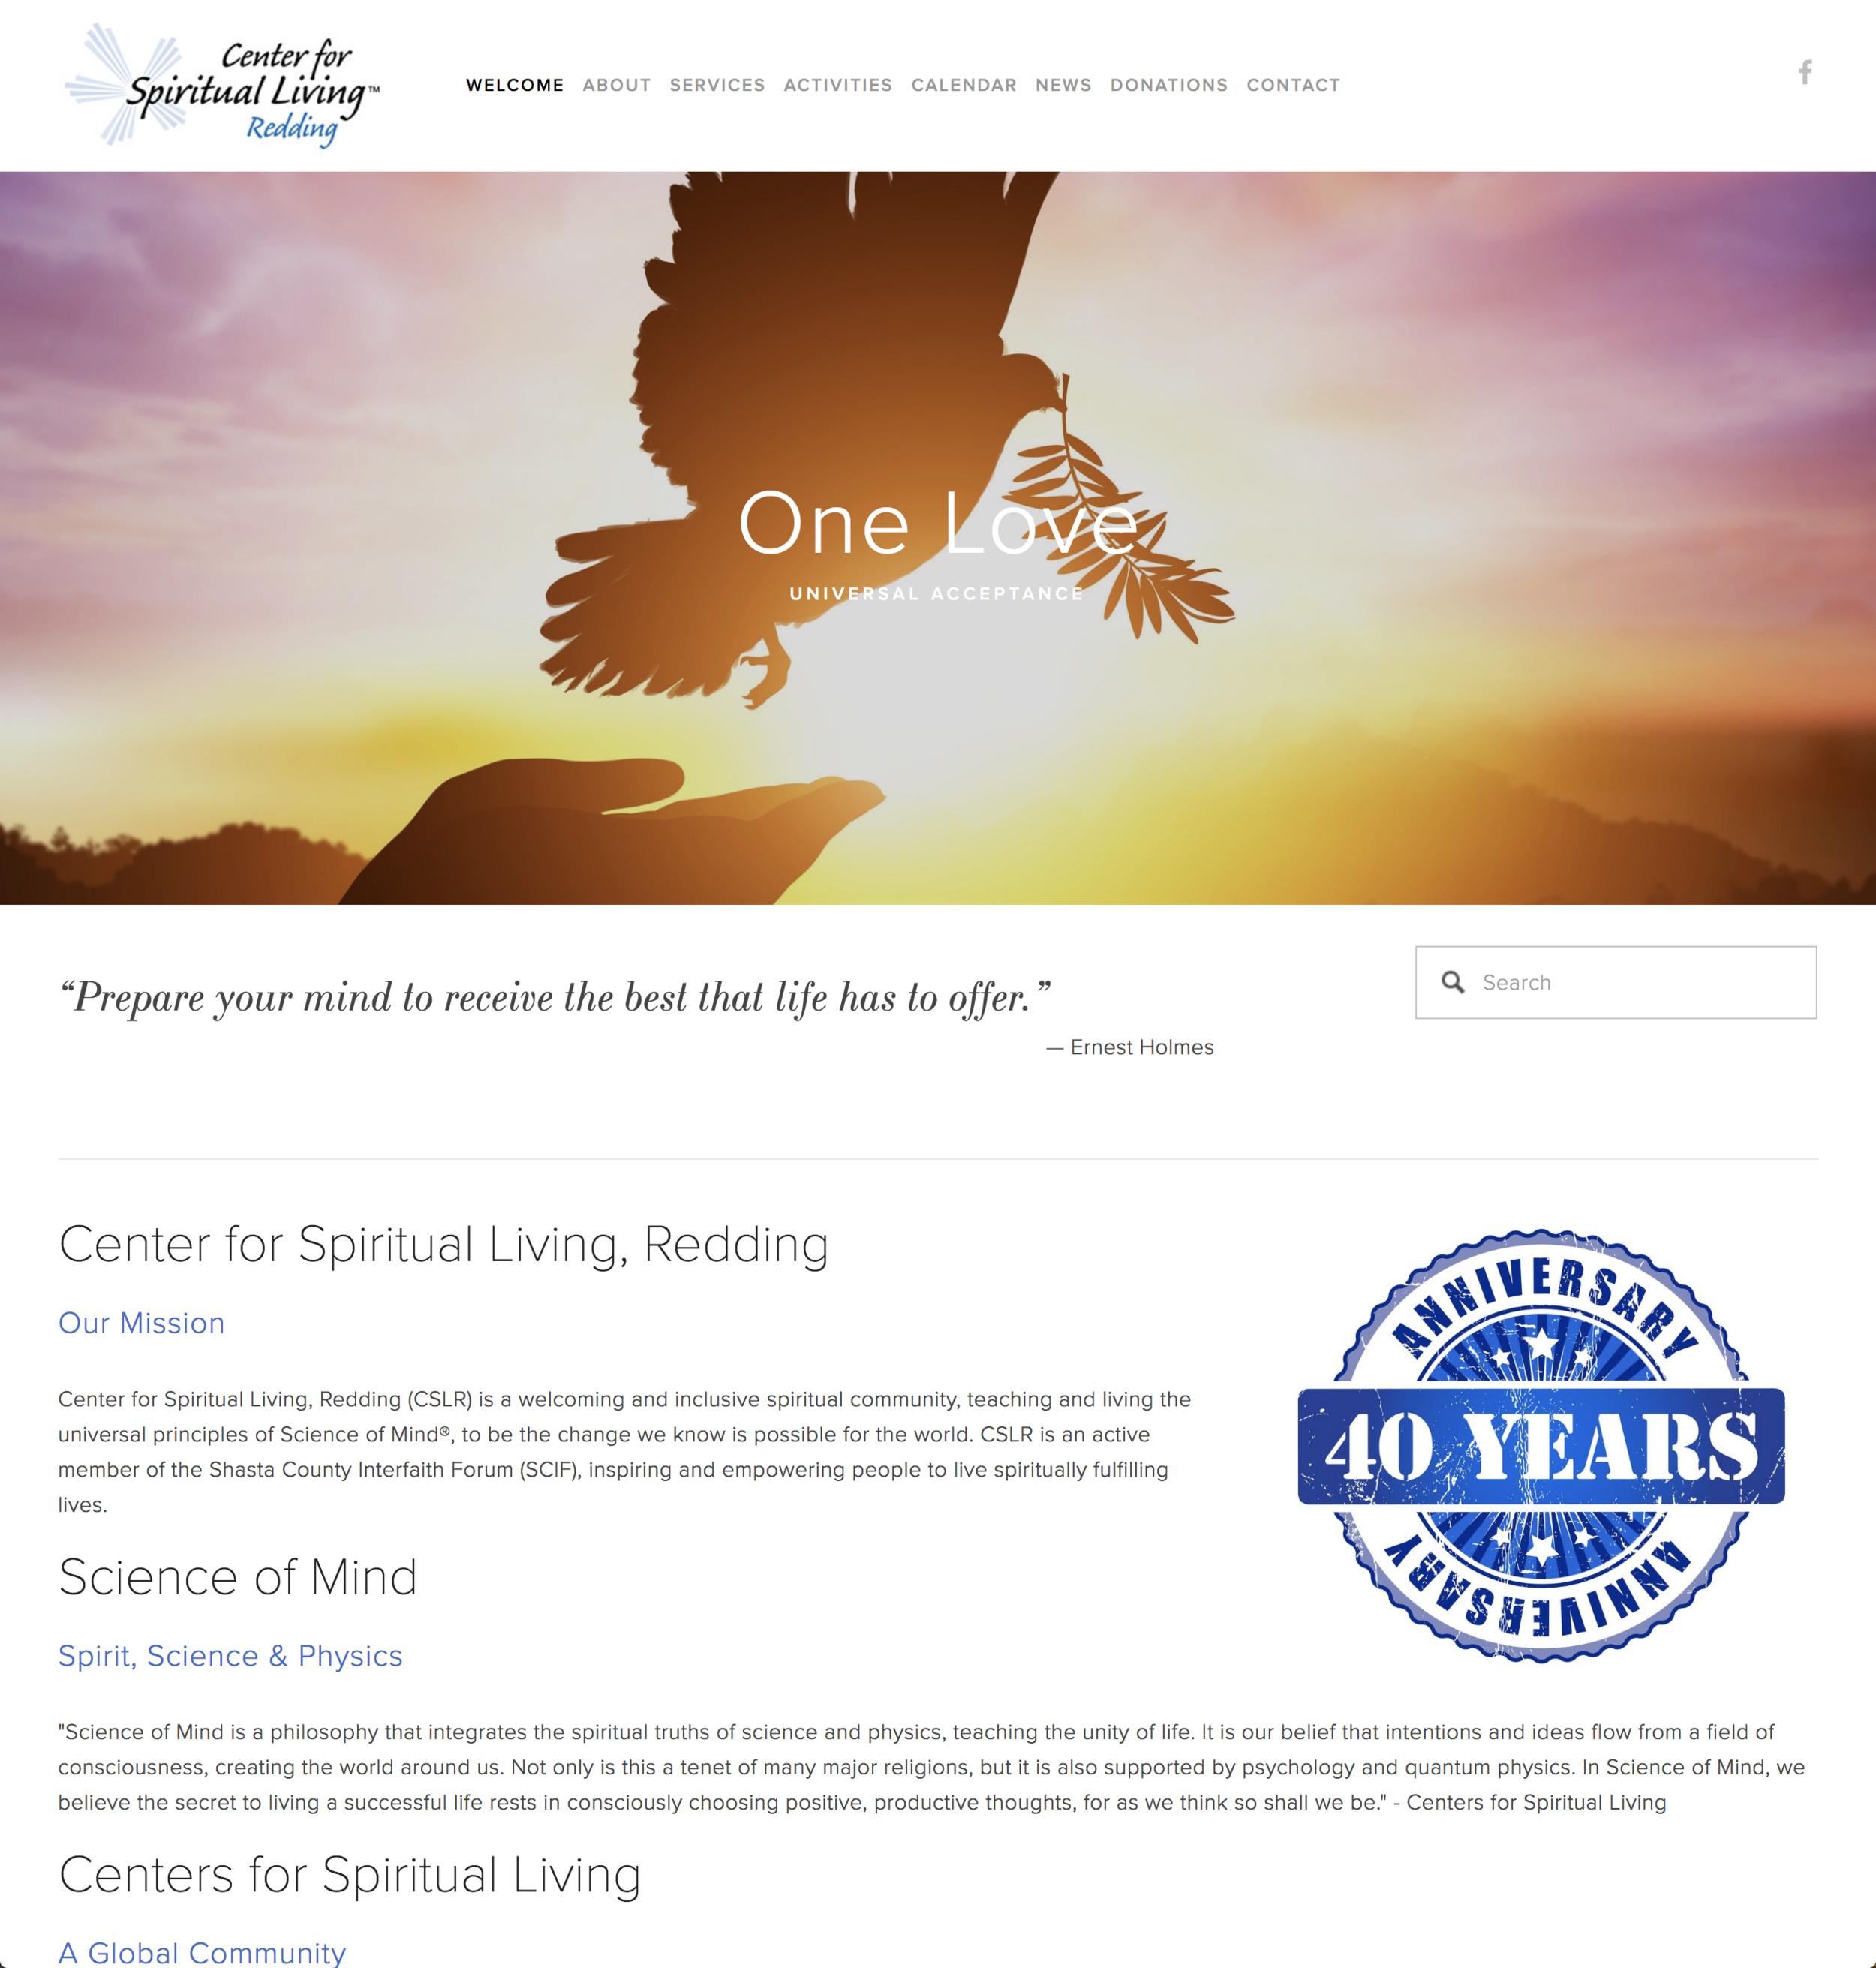 Center for Spiritual Living Redding